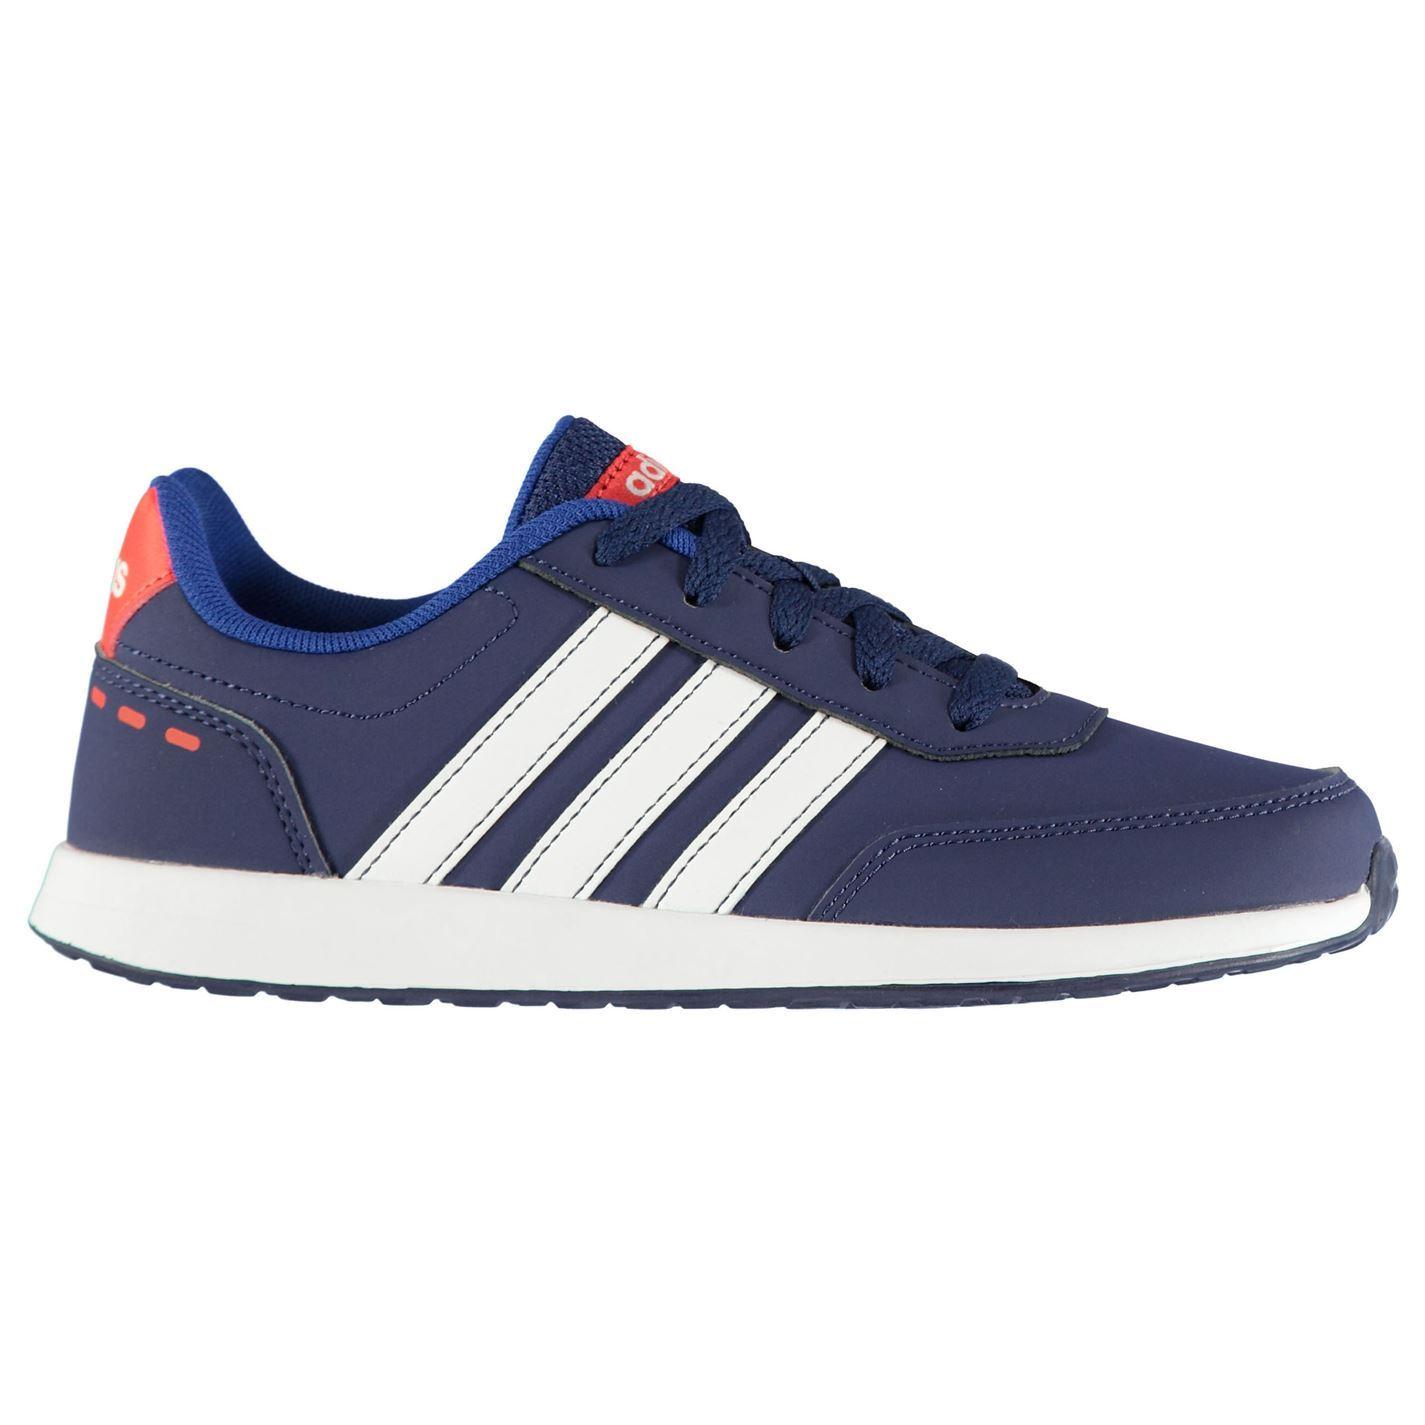 miniatura 4 - ADIDAS-Switch-Nubuck-Scarpe-da-ginnastica-bambino-ragazzo-calzature